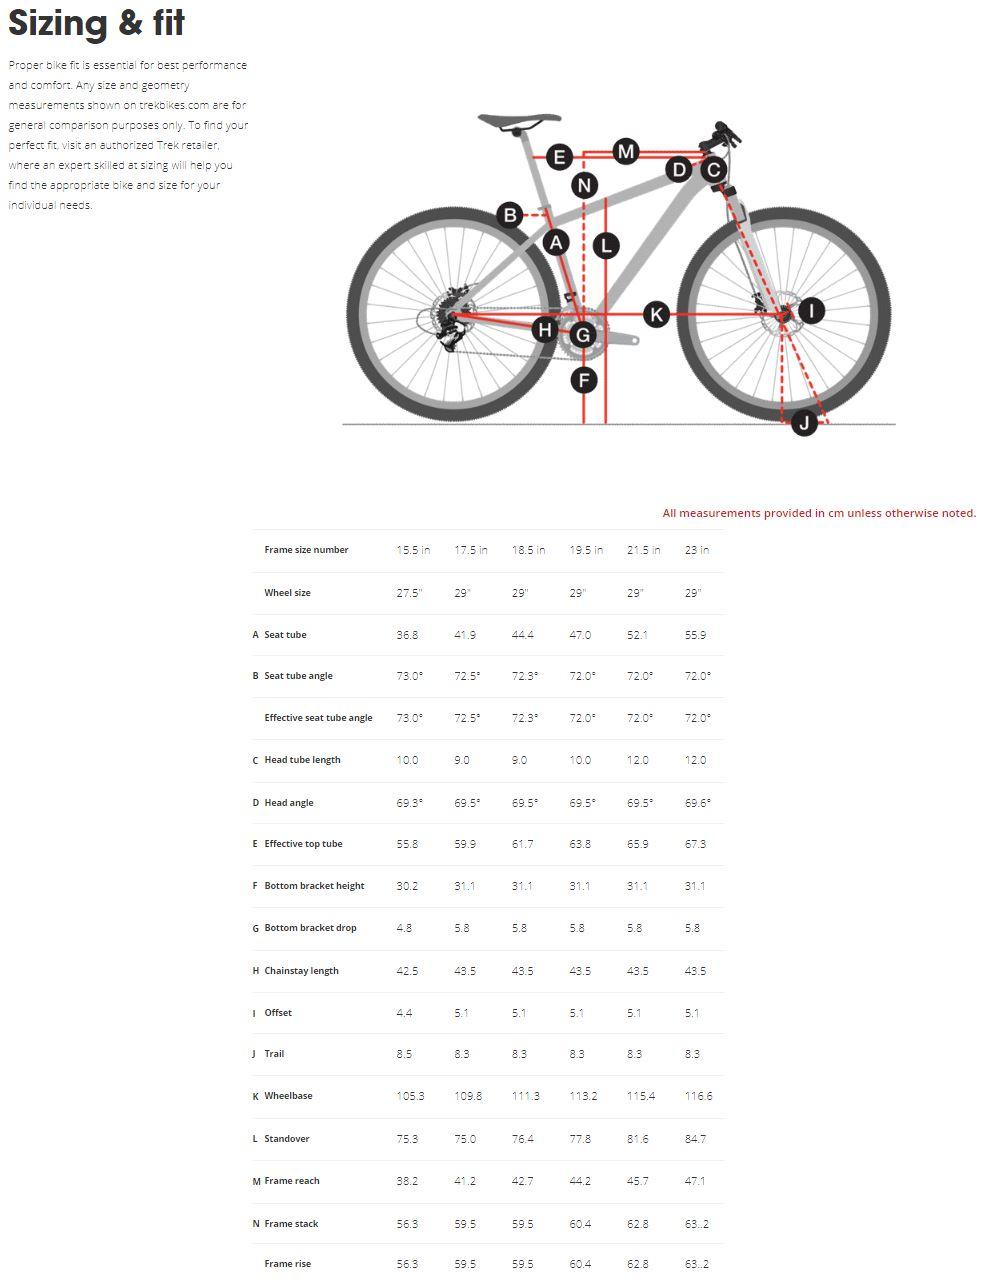 Trek Procaliber AL frameset geometry chart